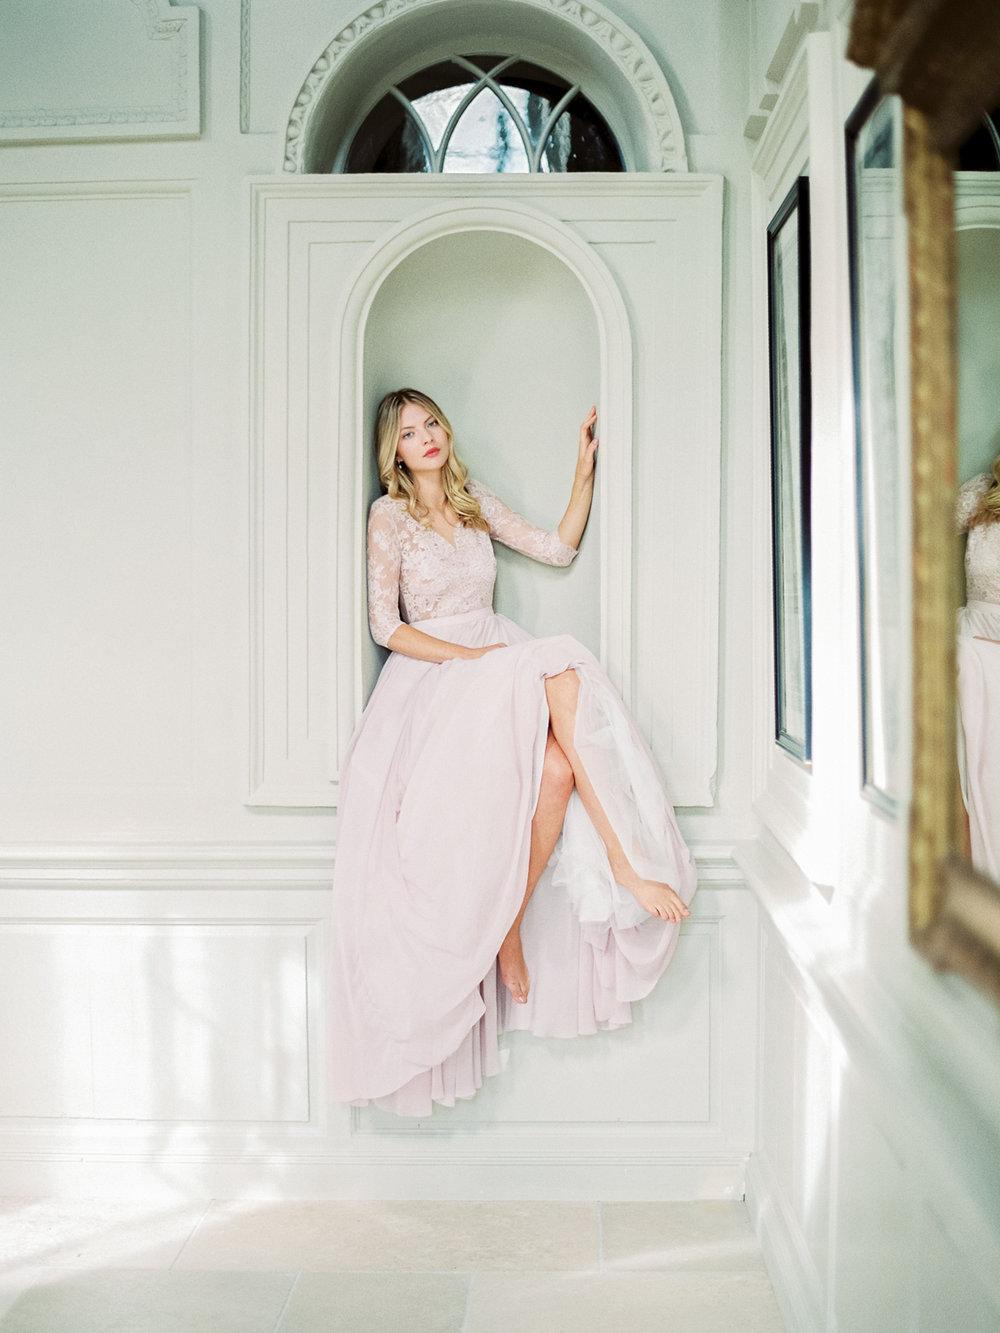 feminine beauty - *insert location/project/client